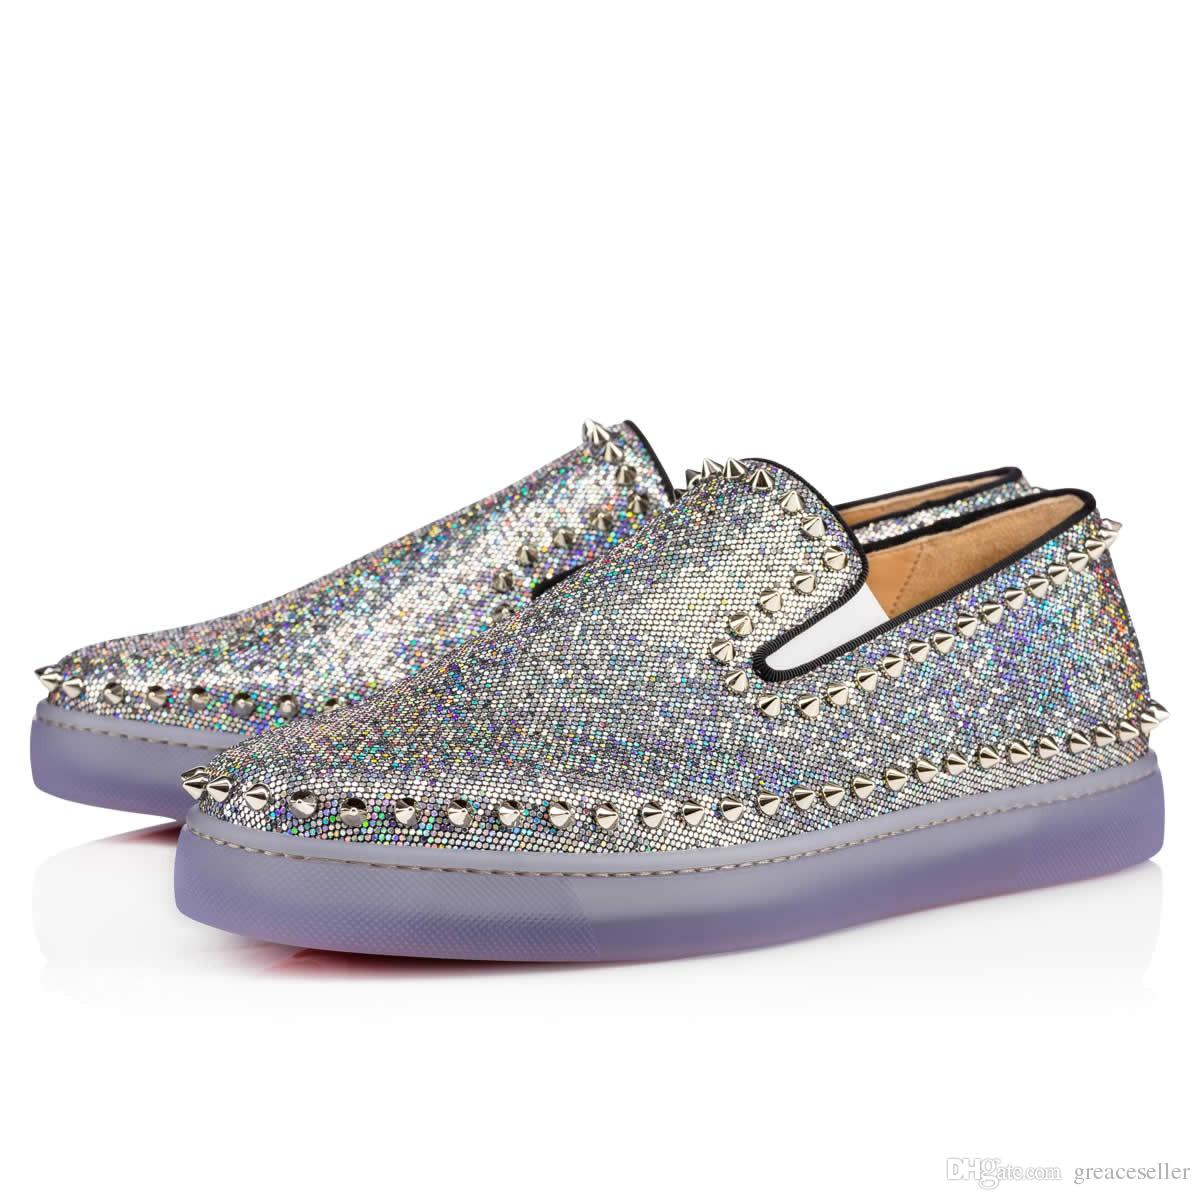 Hot Womens Ladies Casual Beads Slip On Rivet platform Sneakers Glitter Shoes